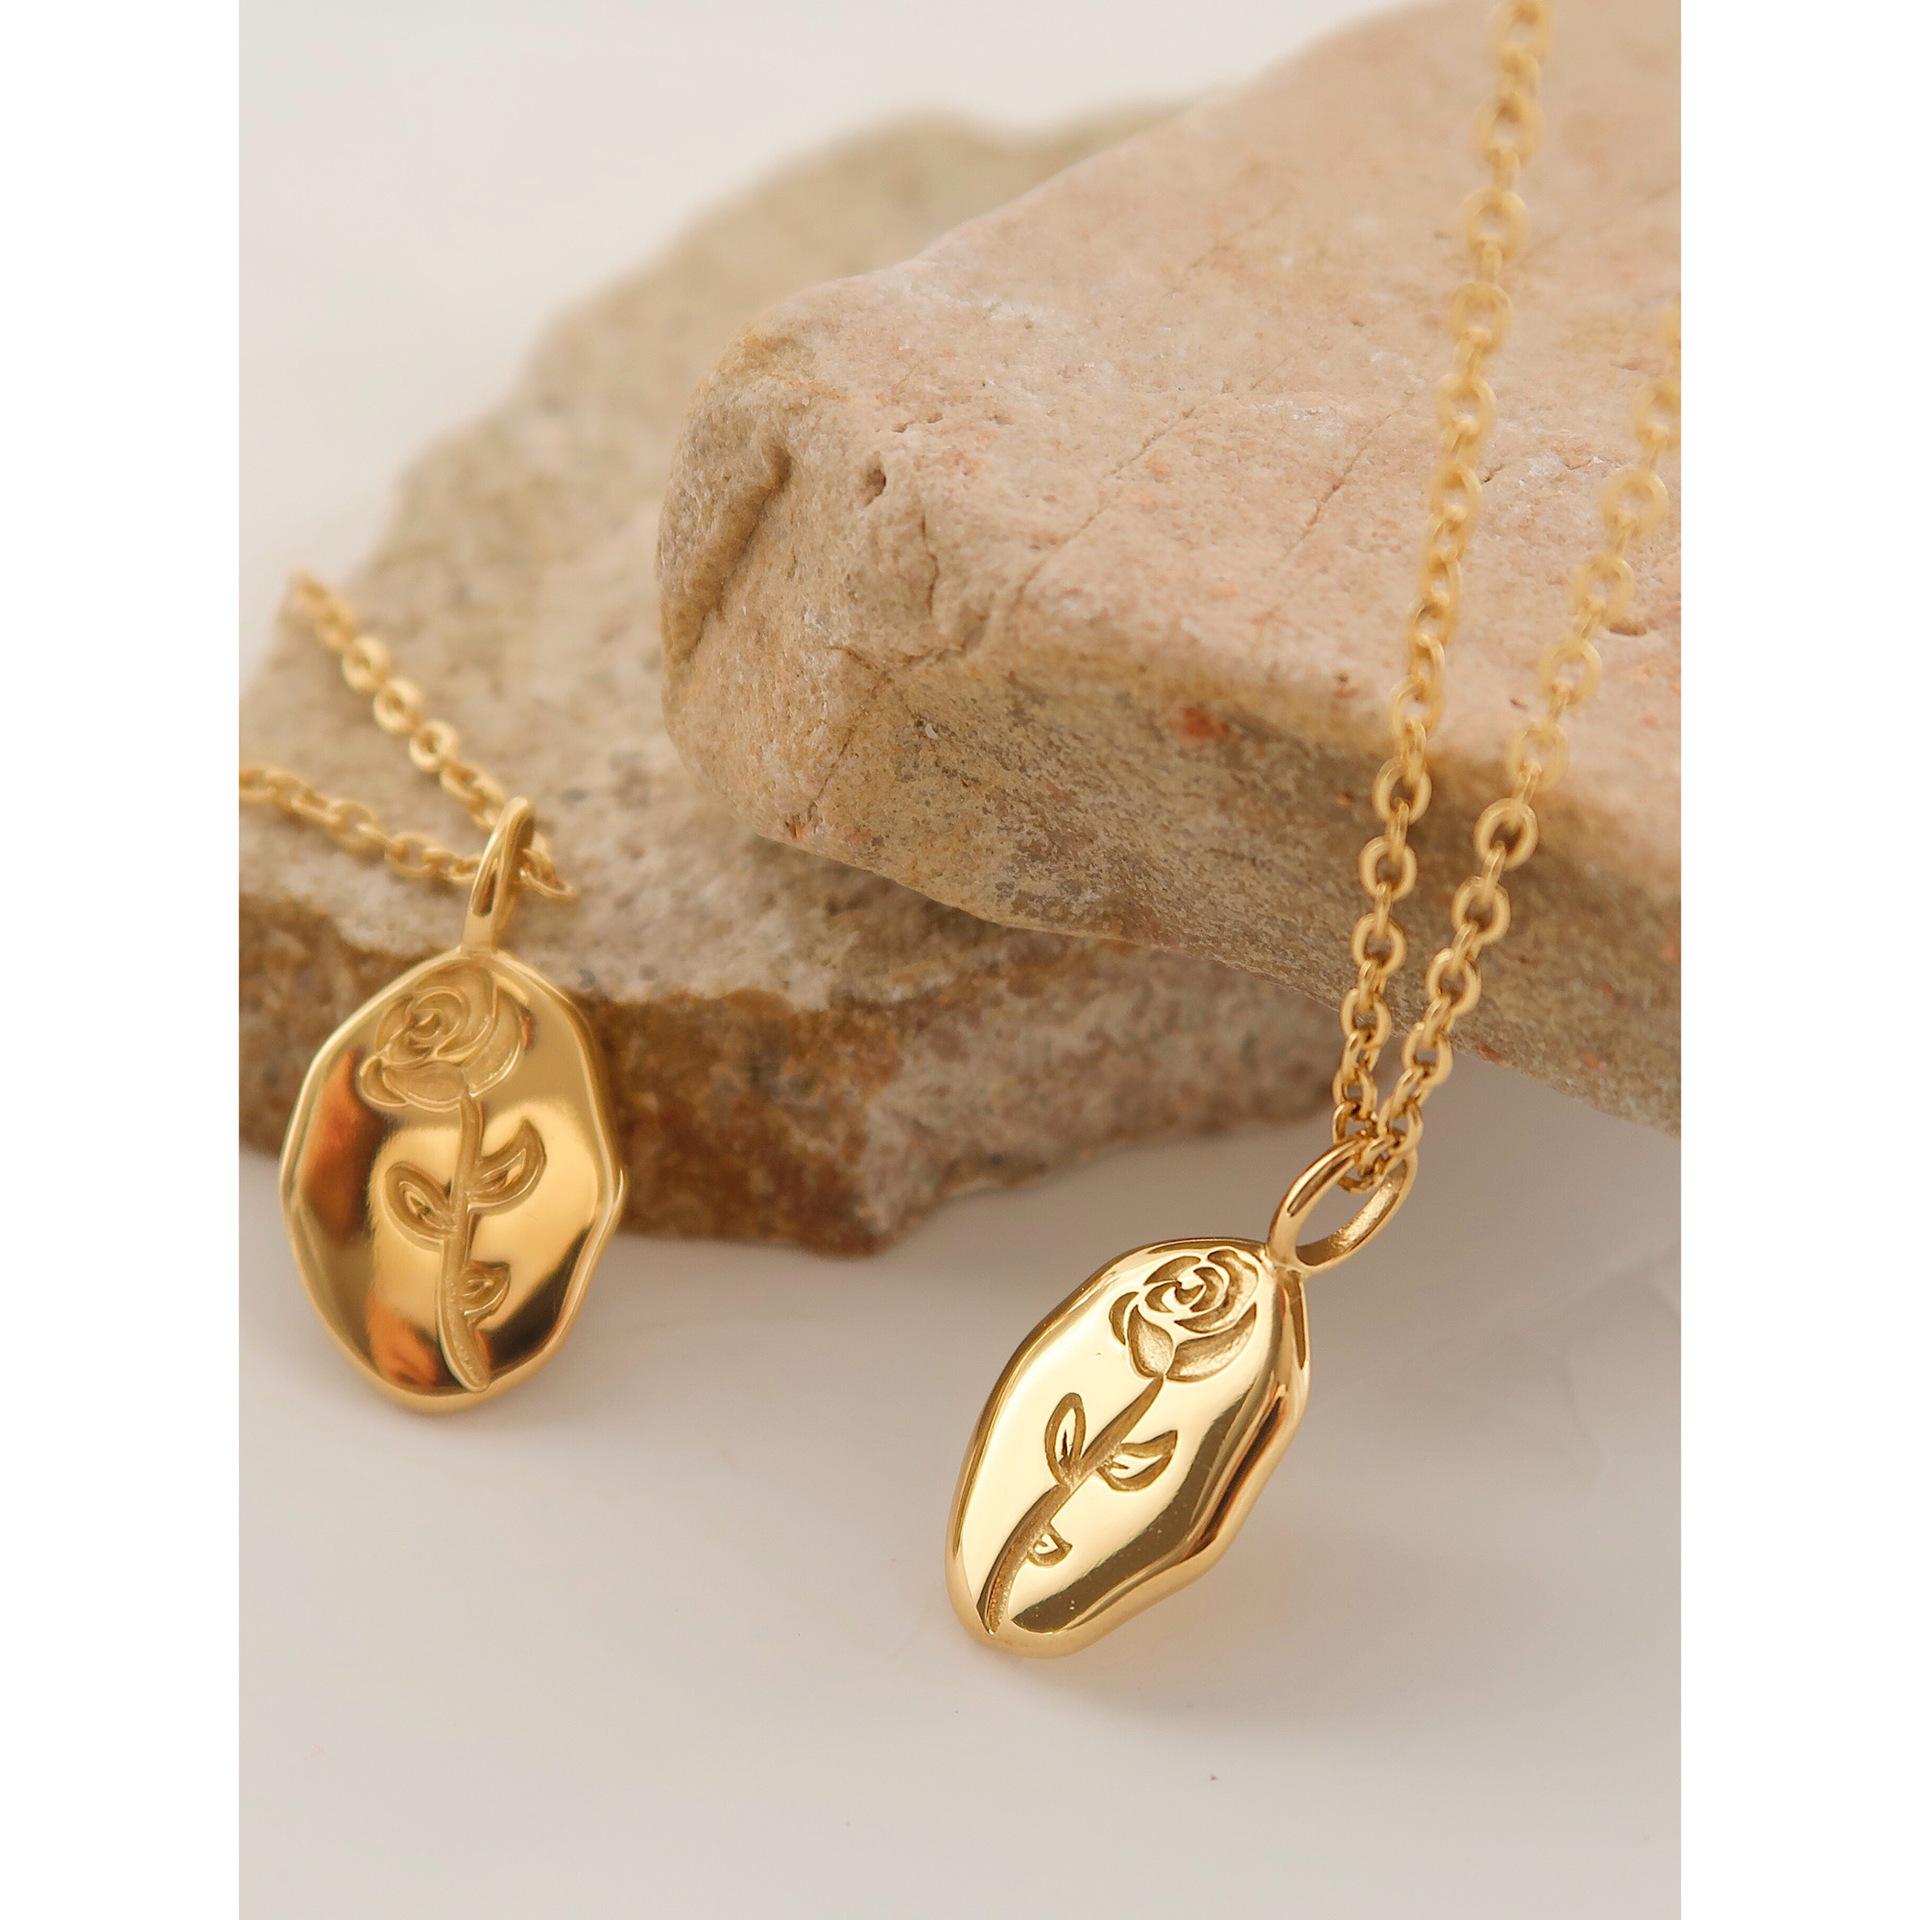 Lavish Titanium Steel Chain Necklace for Posh Fashion Looks